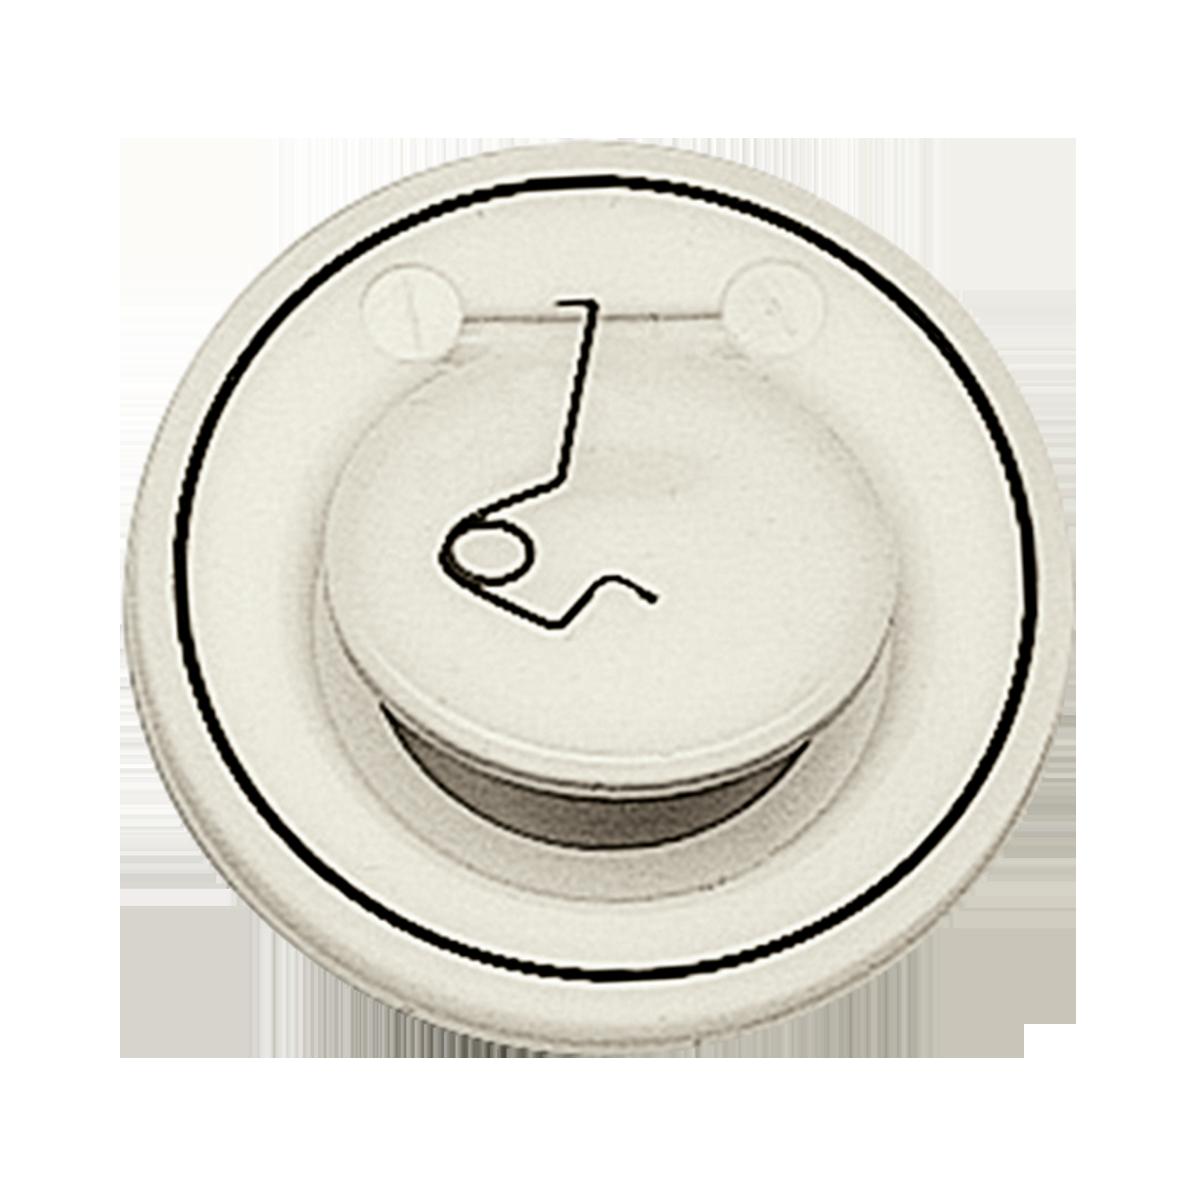 Praher Wafer type check valve S4 PP, beige